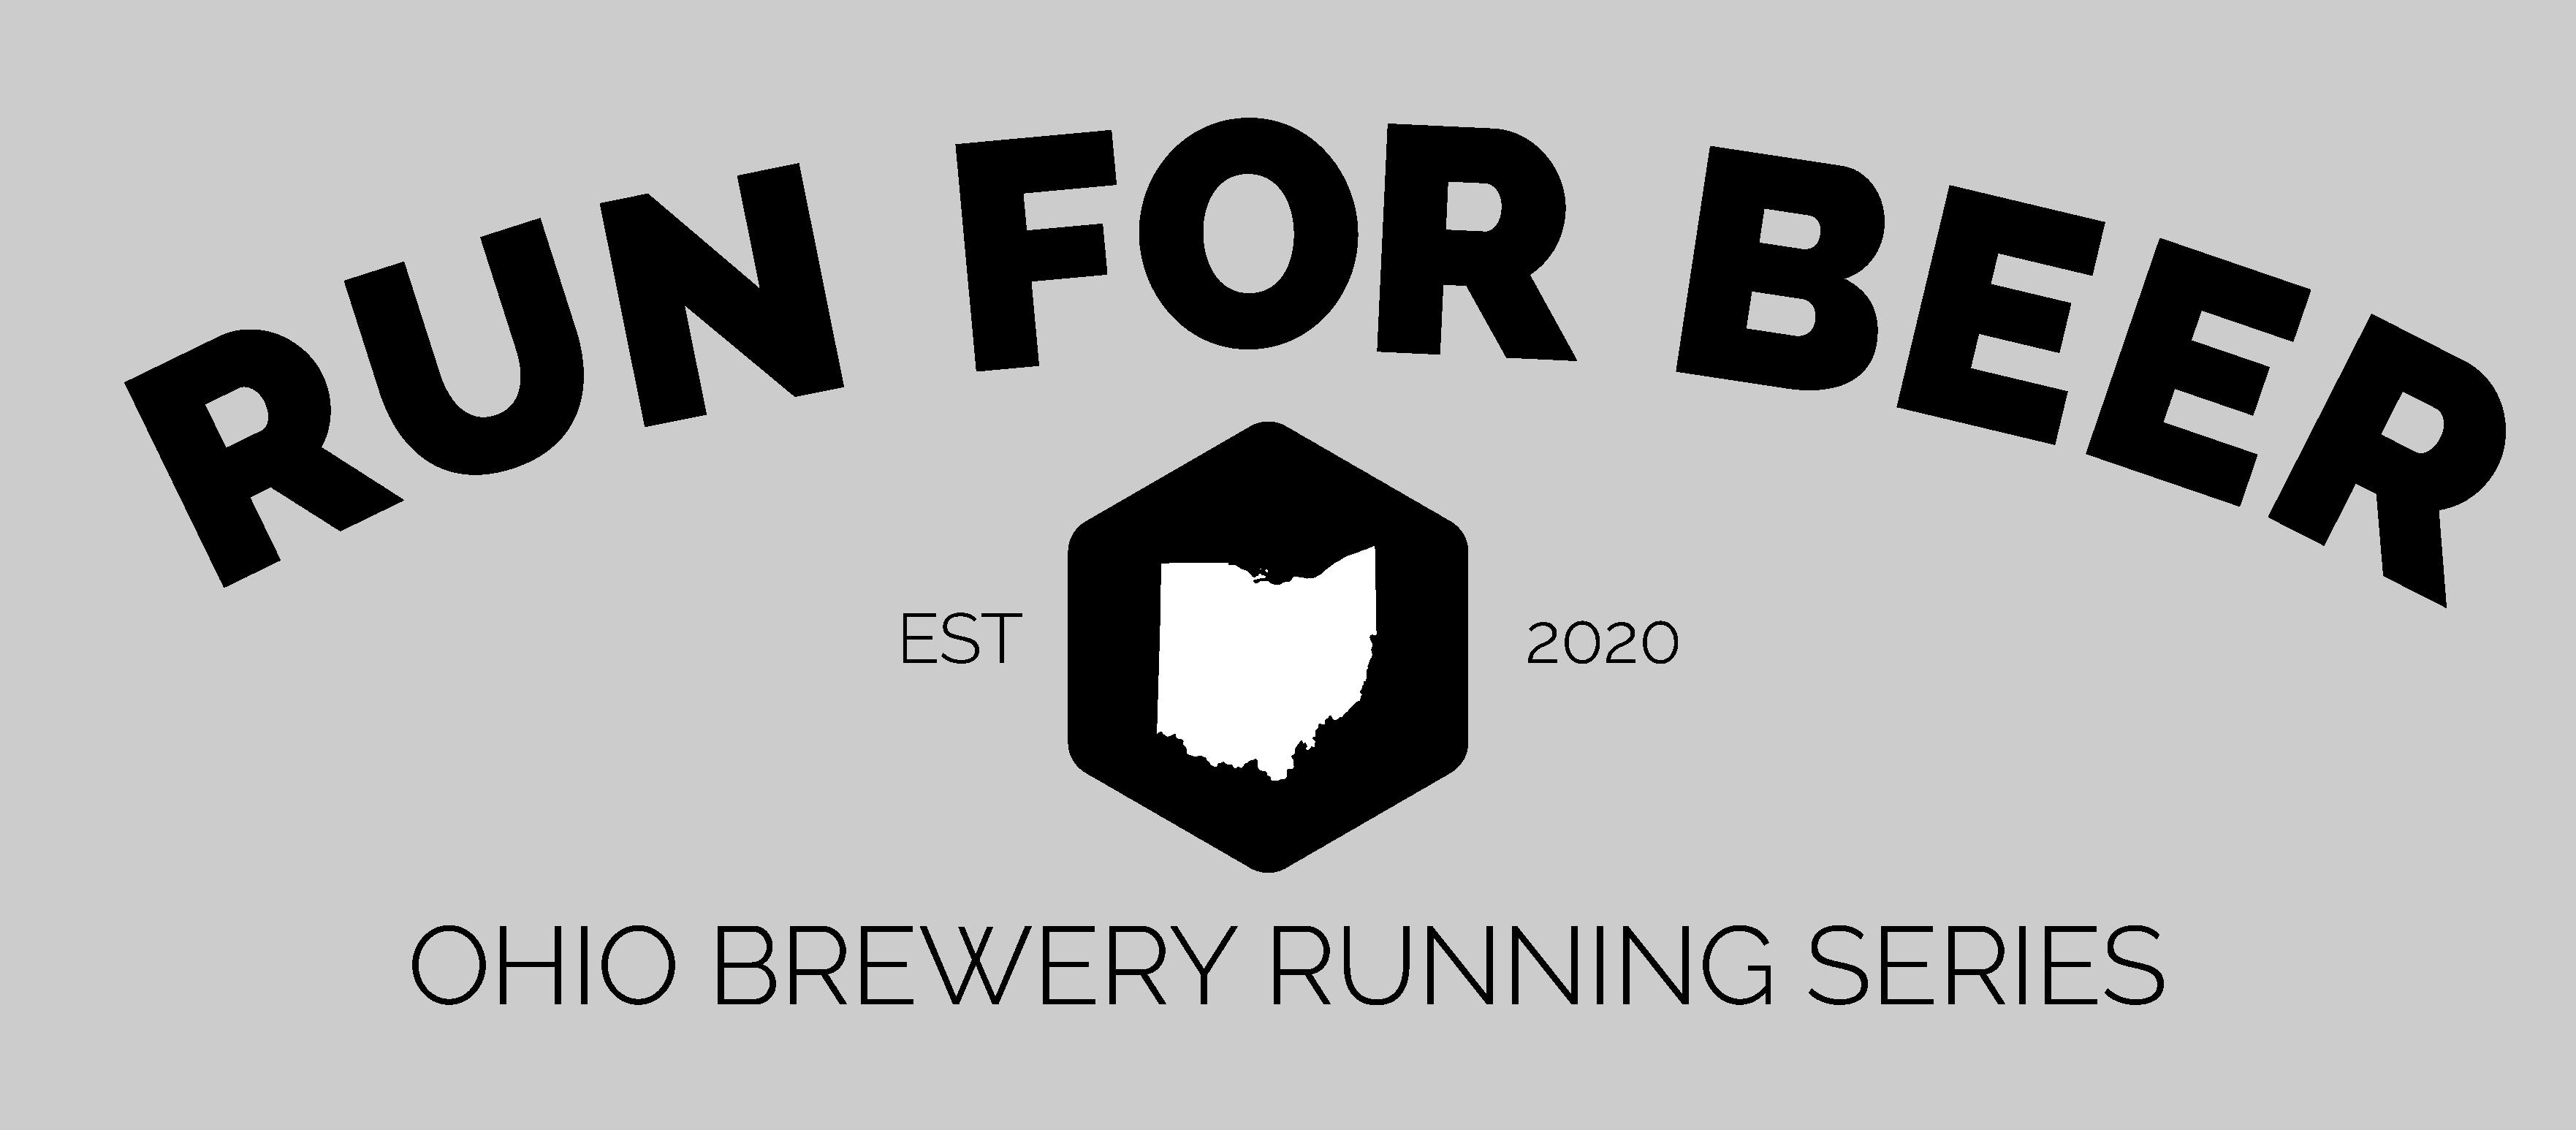 Texas Brewery Running Series